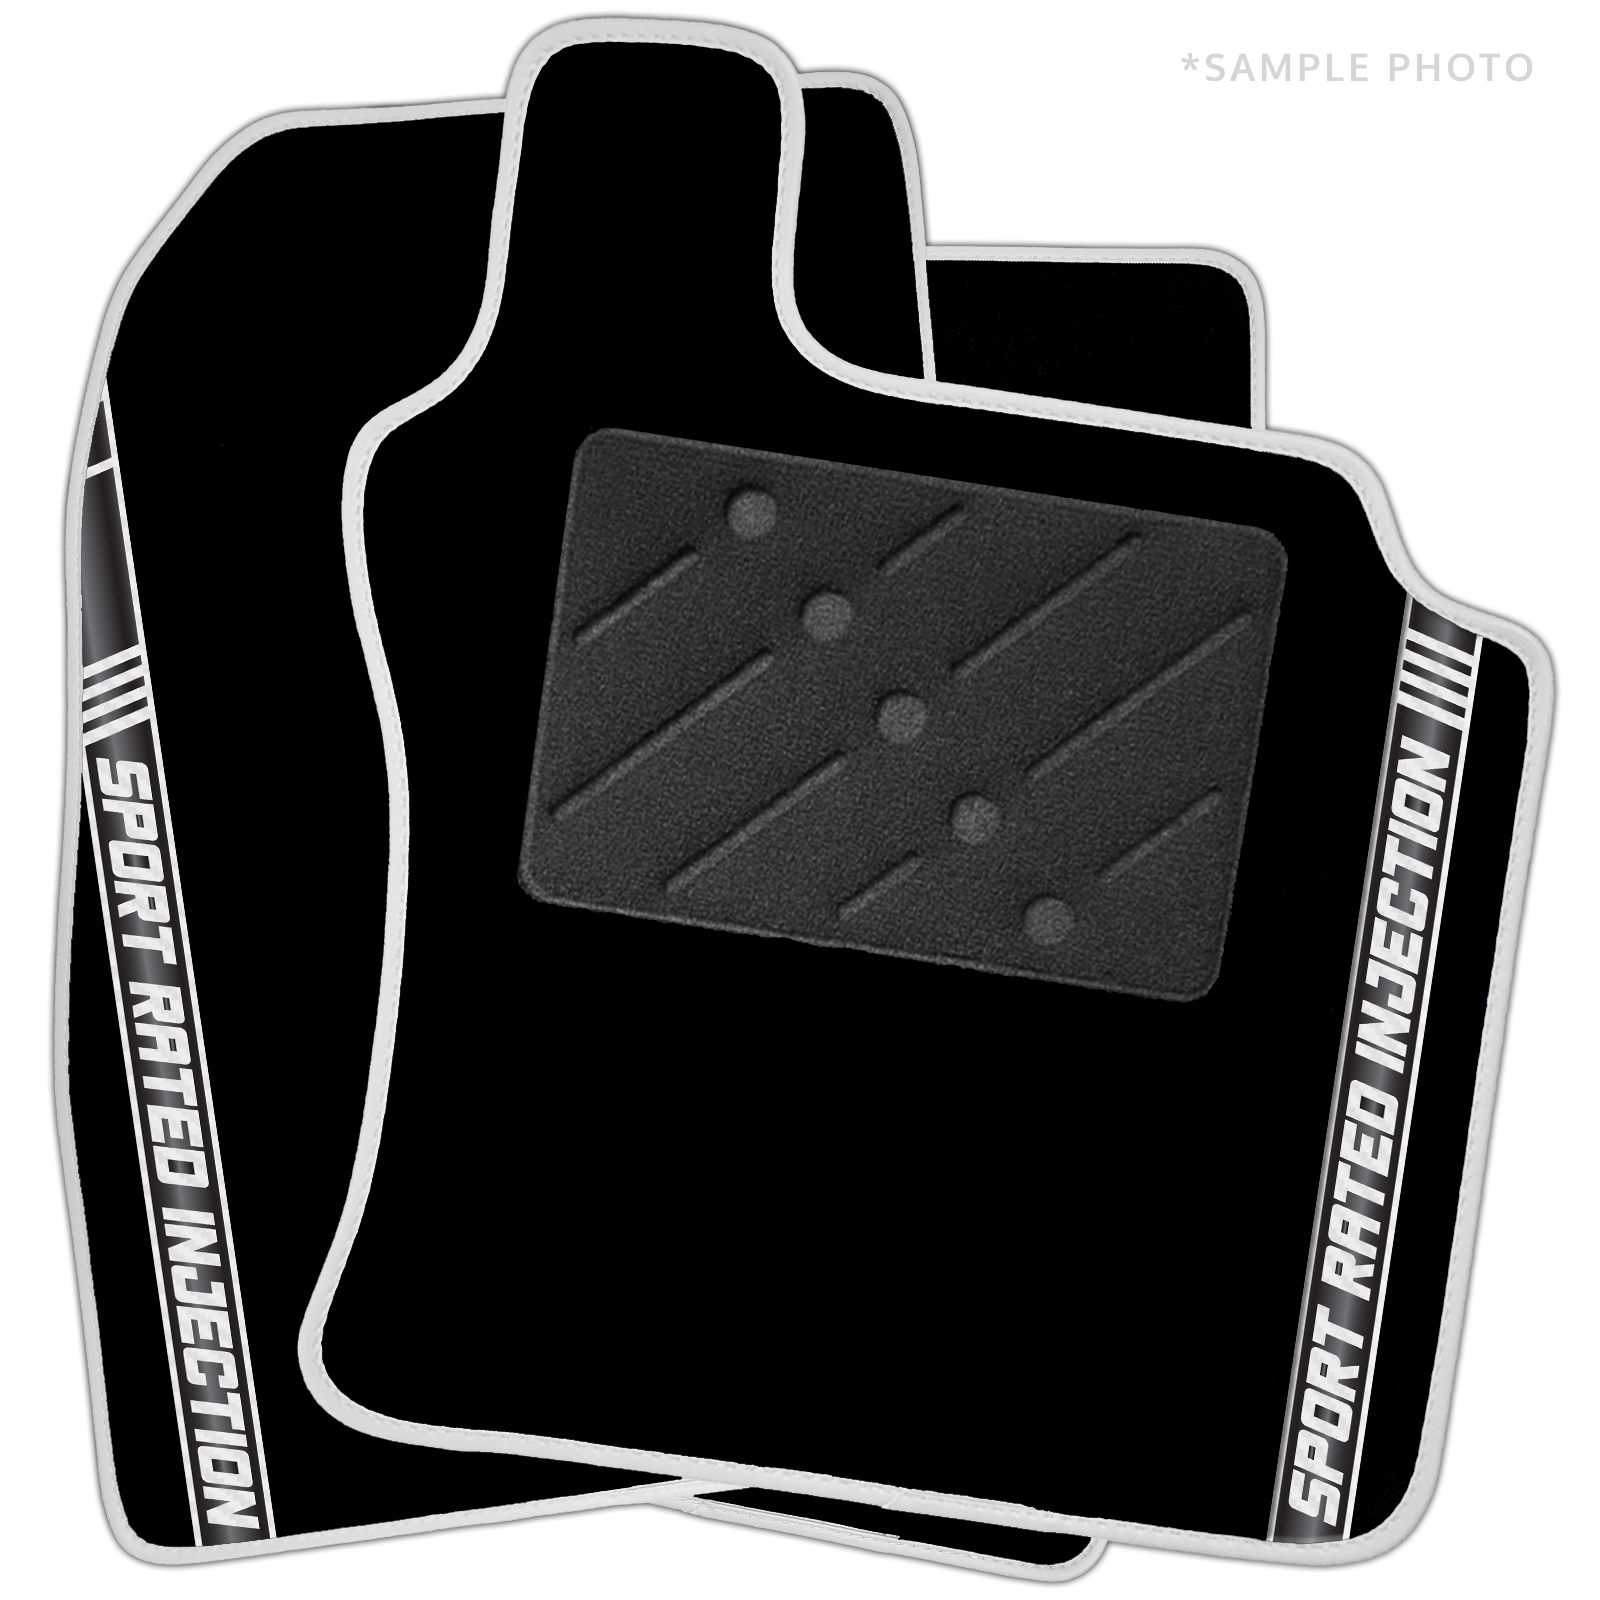 VAUXHALL ANTARA 07-ON Full Set Leather Look Beige Seat Covers Protectors